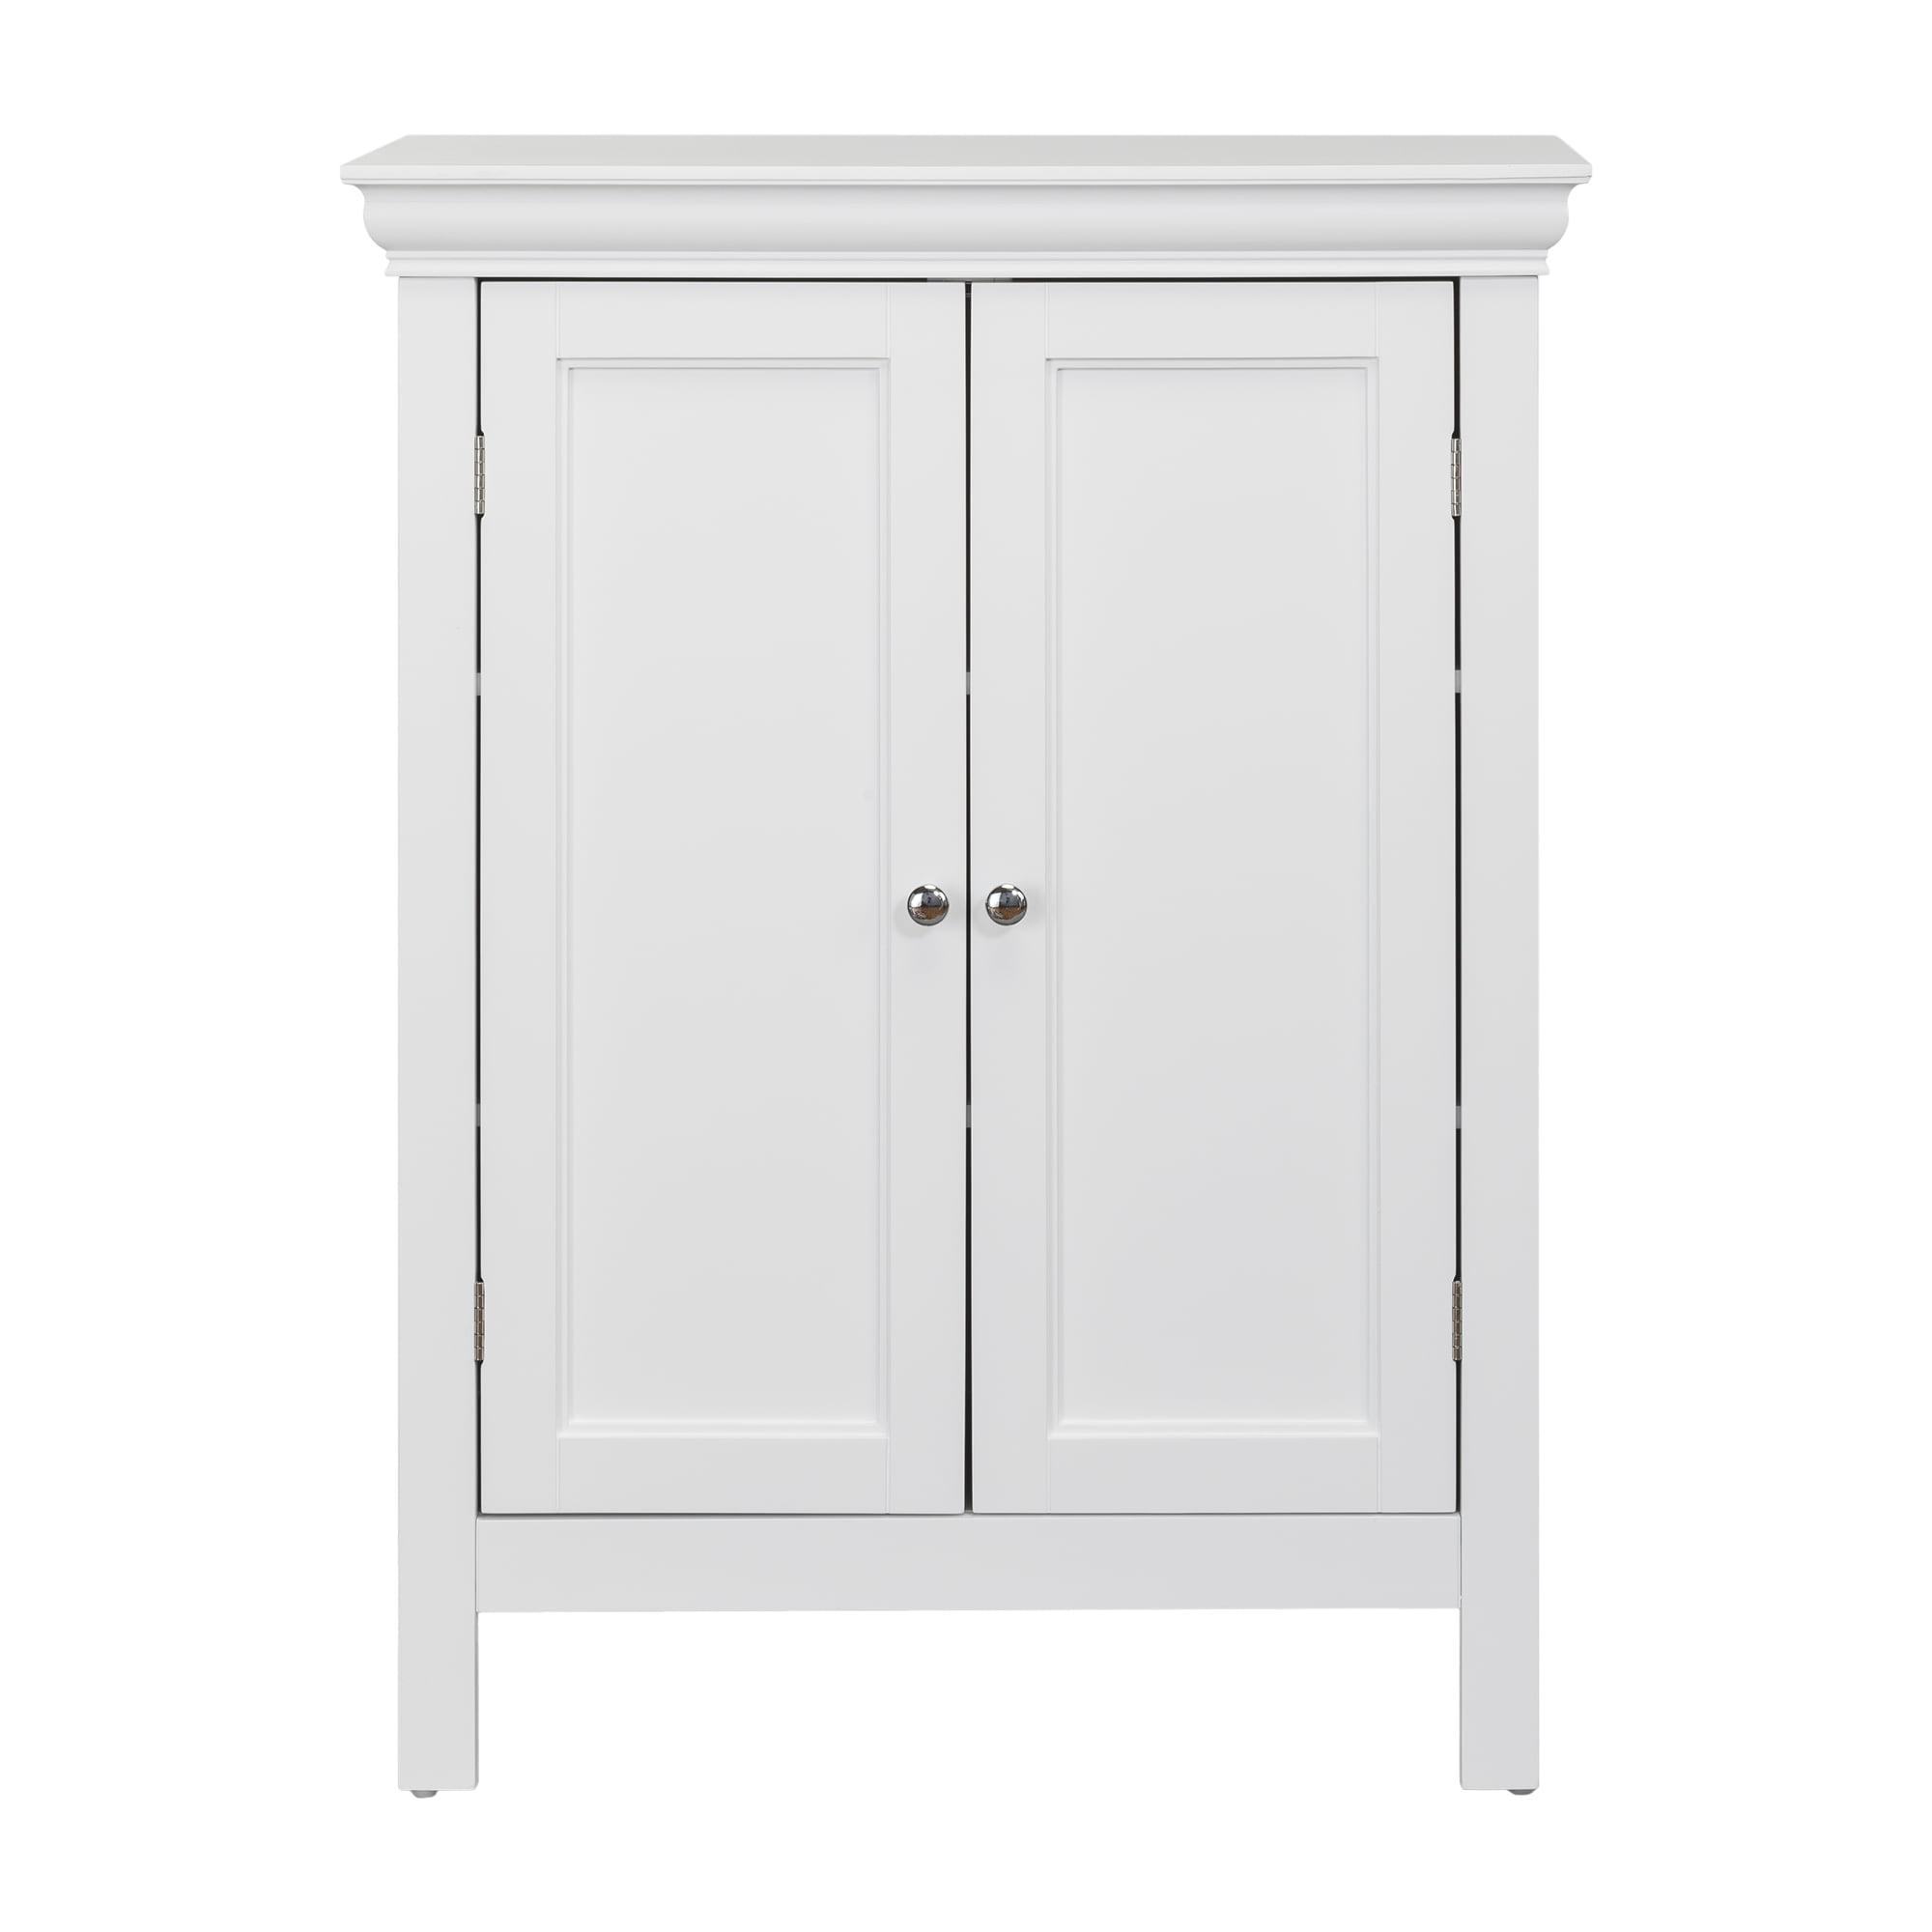 Elegant Home Fashions Teton 2 Door Bathroom Floor Storage Cabinet